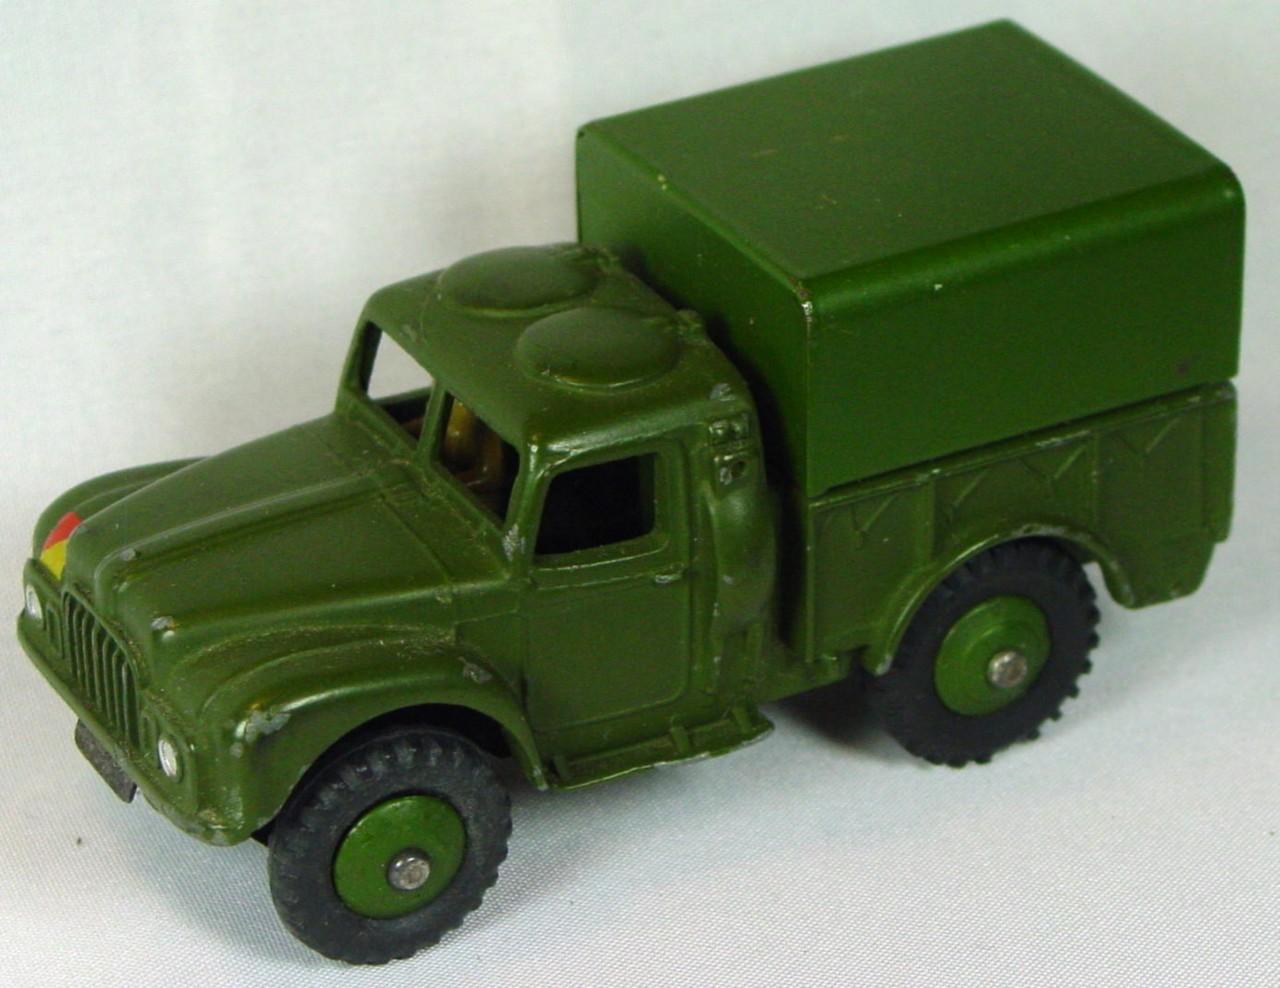 Dinky 641 - Humbar Army 1 Ton Truck